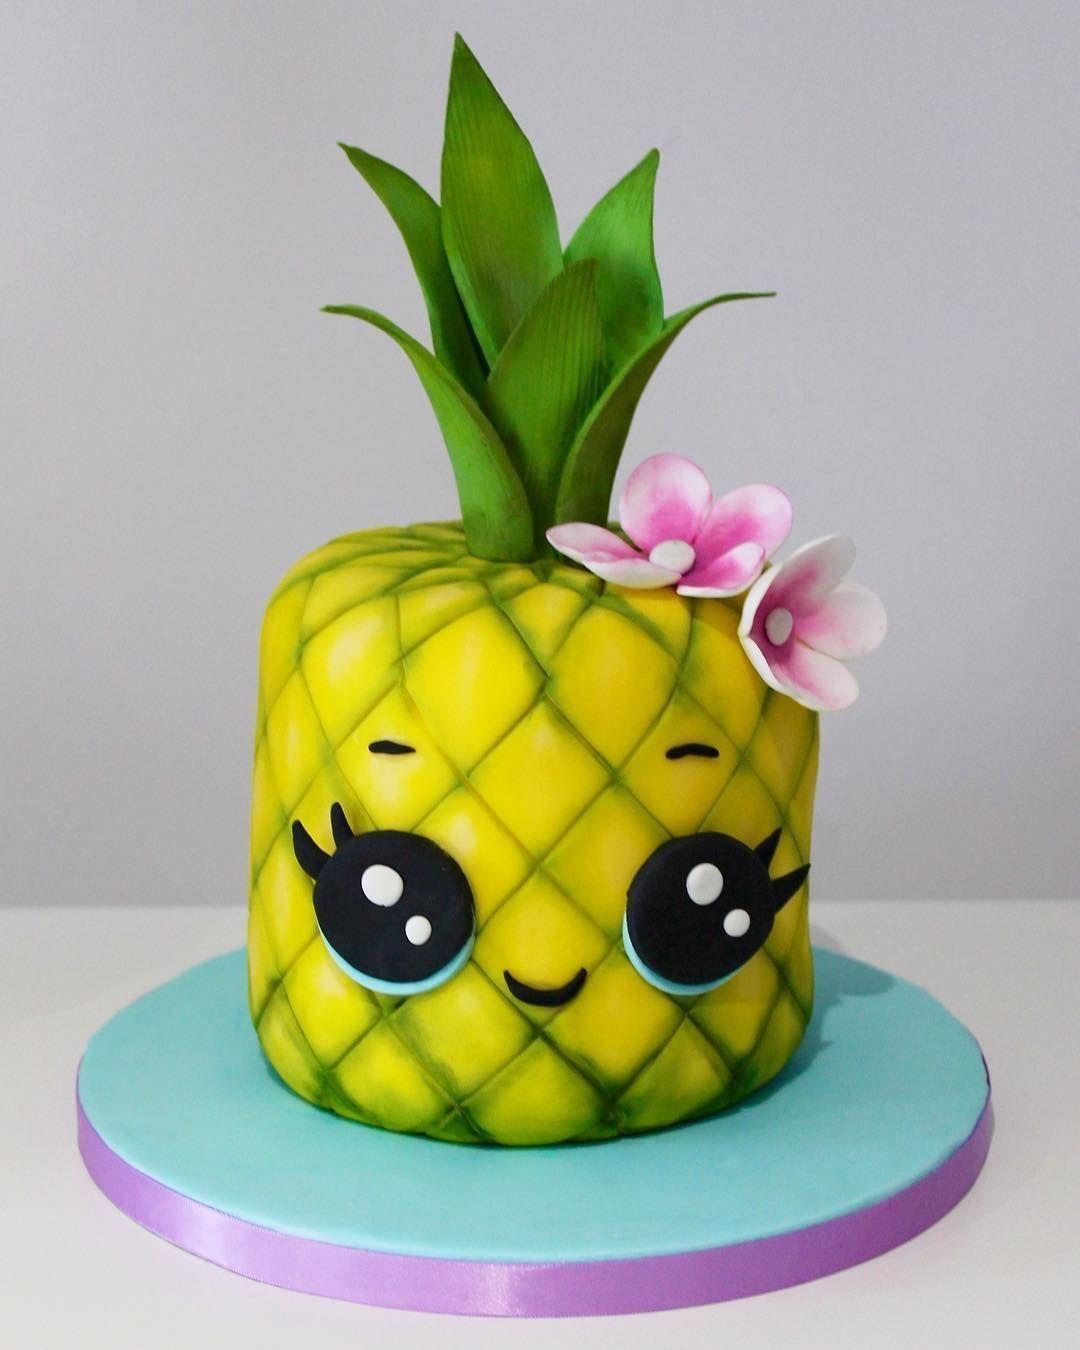 PAC002 - Pineapple Cake